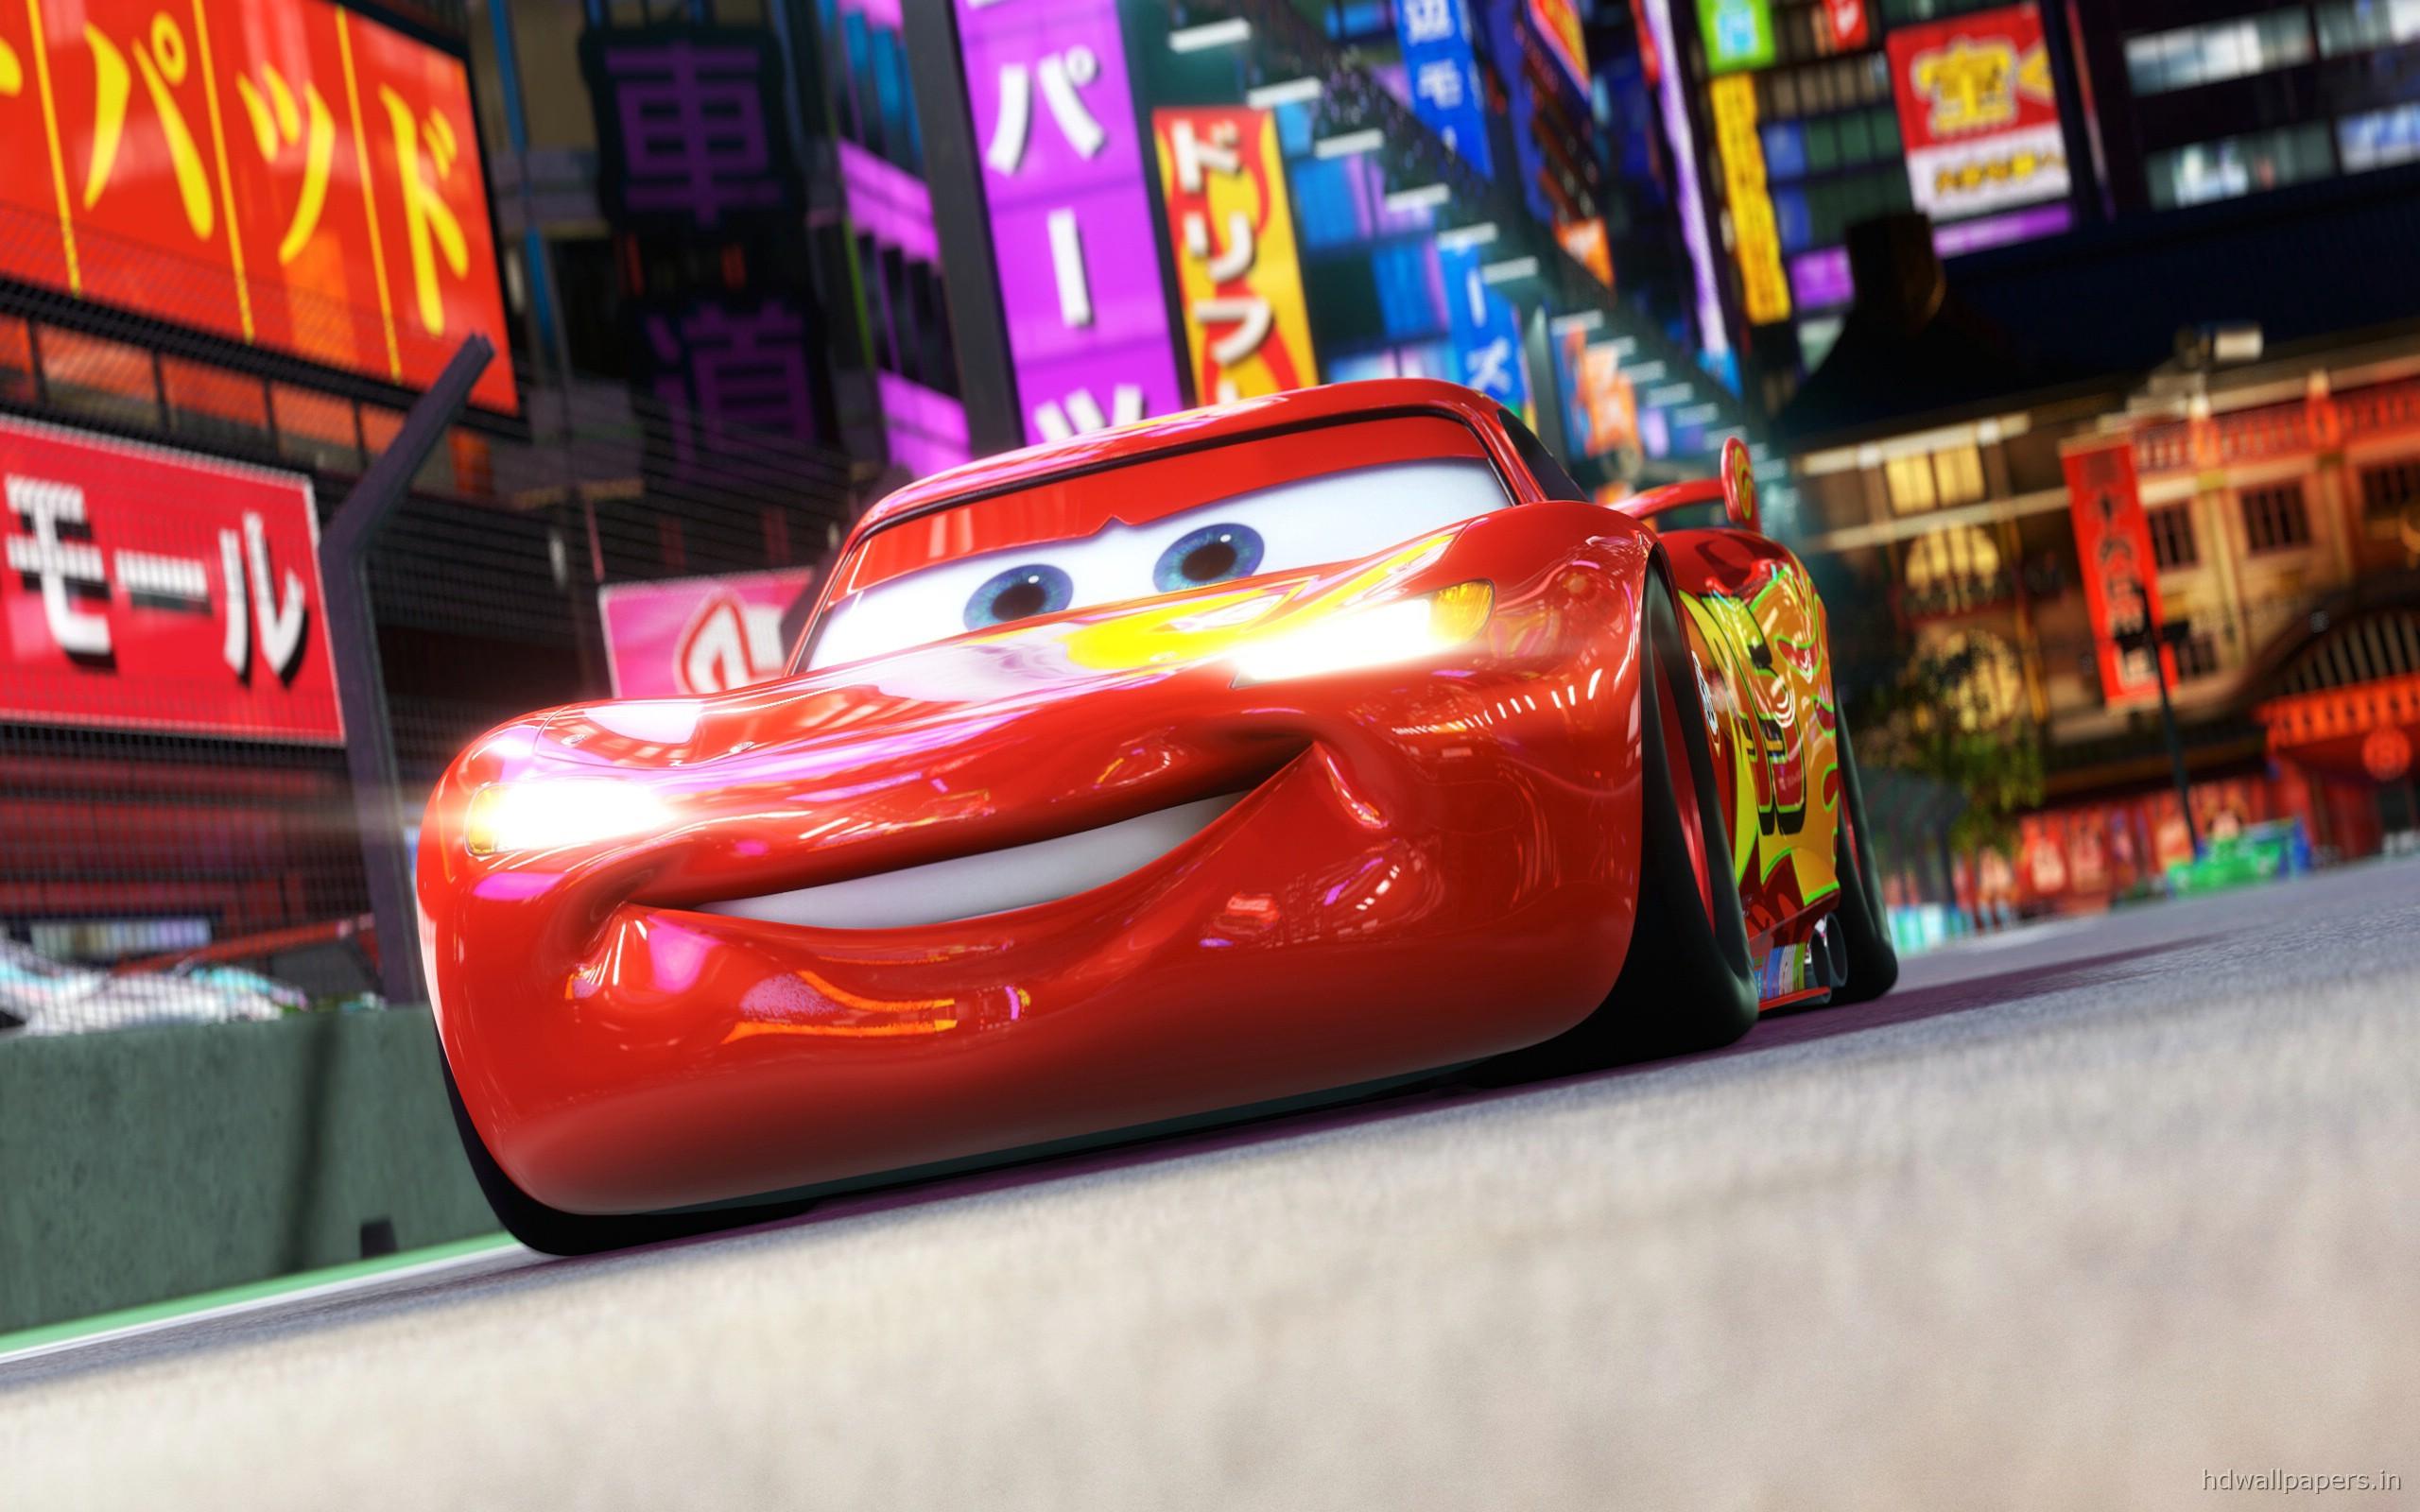 Lightning McQueen in Cars 2 Wallpapers HD Wallpapers 2560x1600